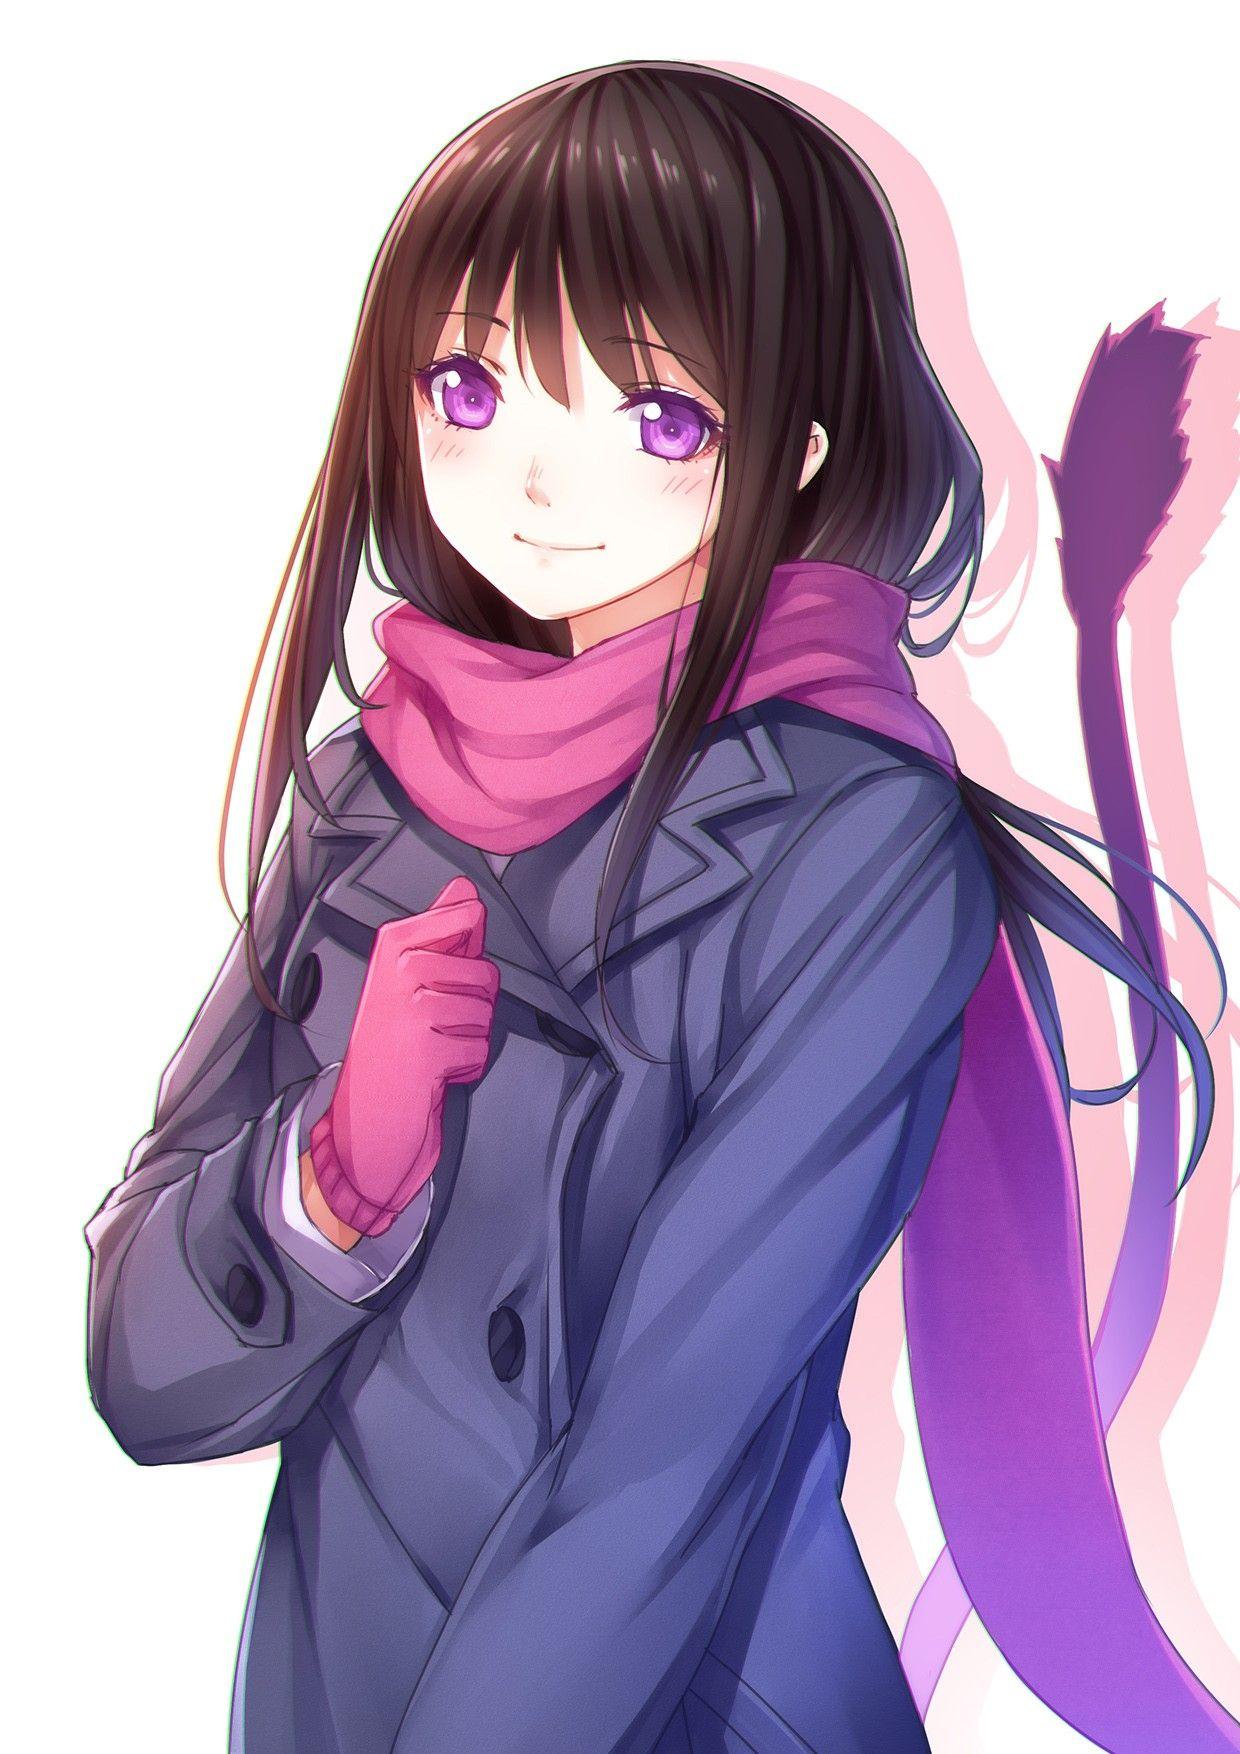 noragami anime manga kawaii cute girl Noragami anime